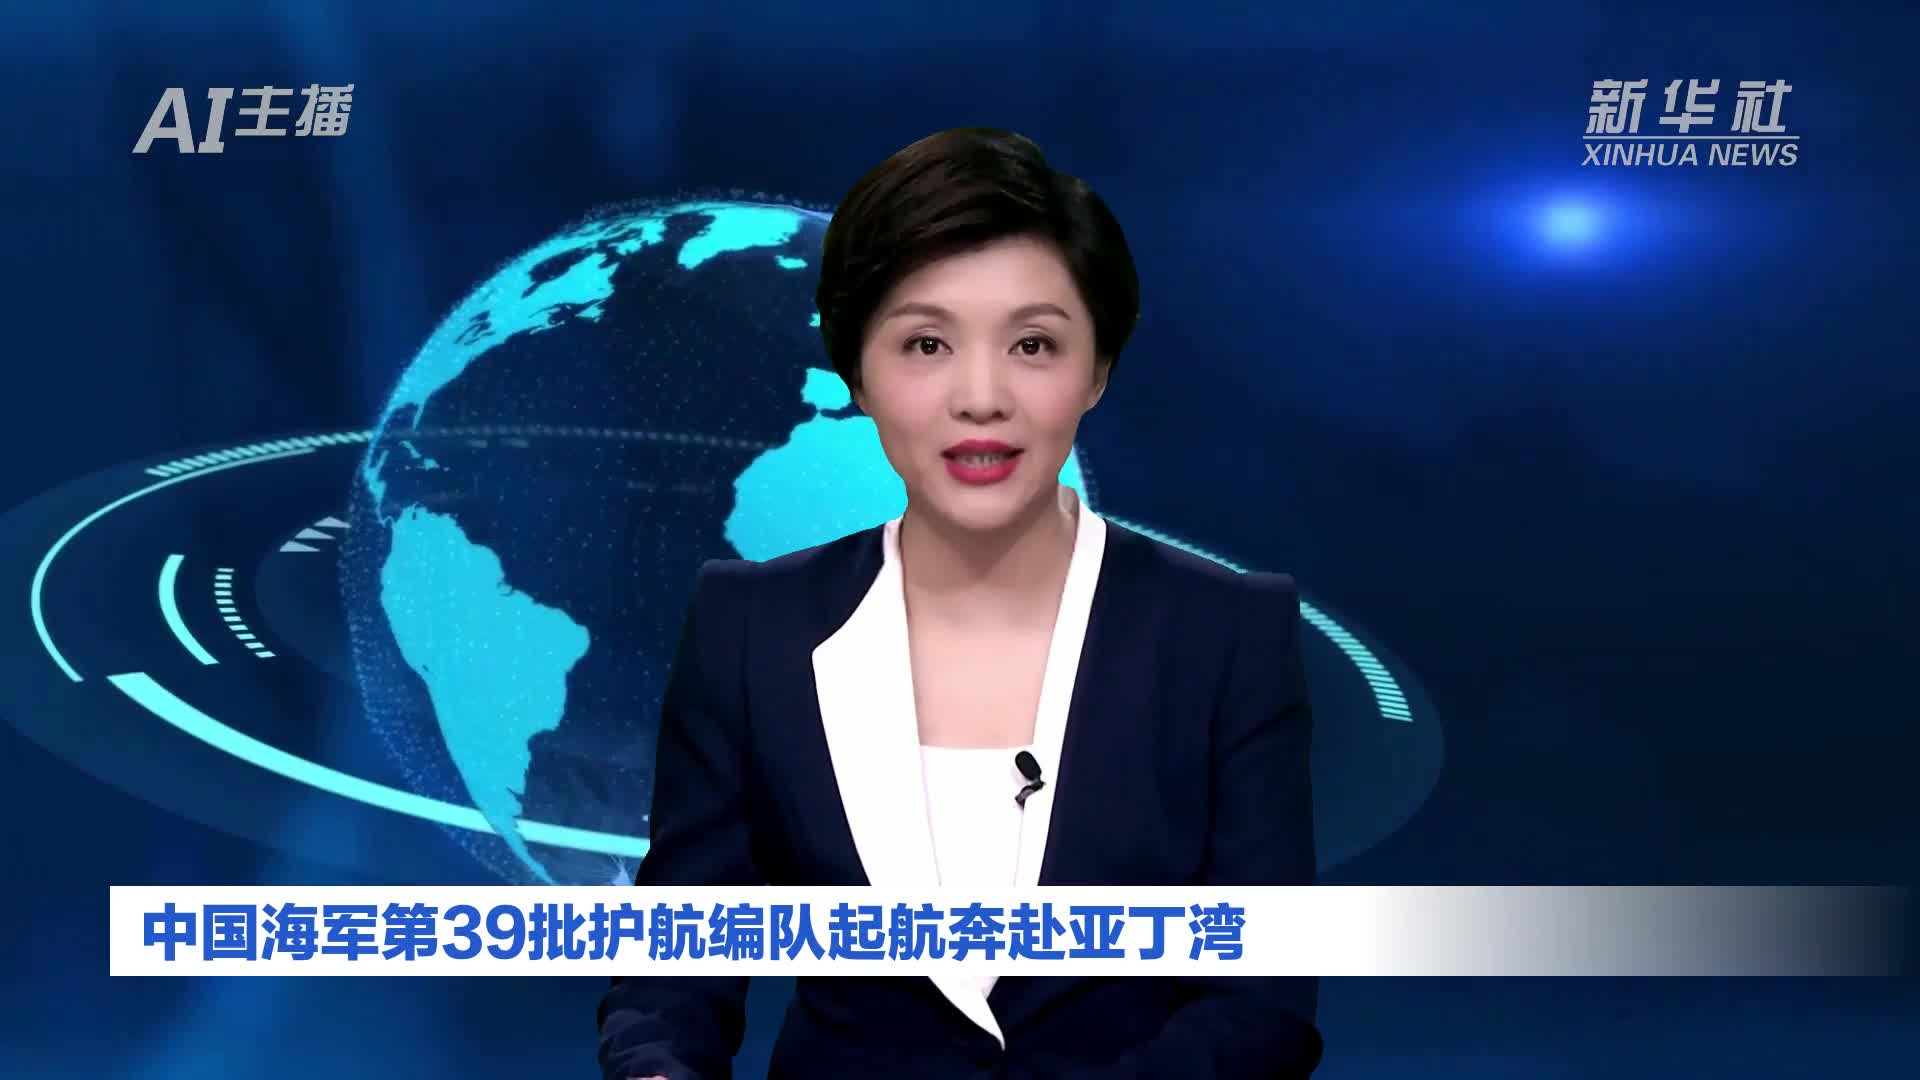 AI合成主播|中国海军第39批护航编队起航奔赴亚丁湾